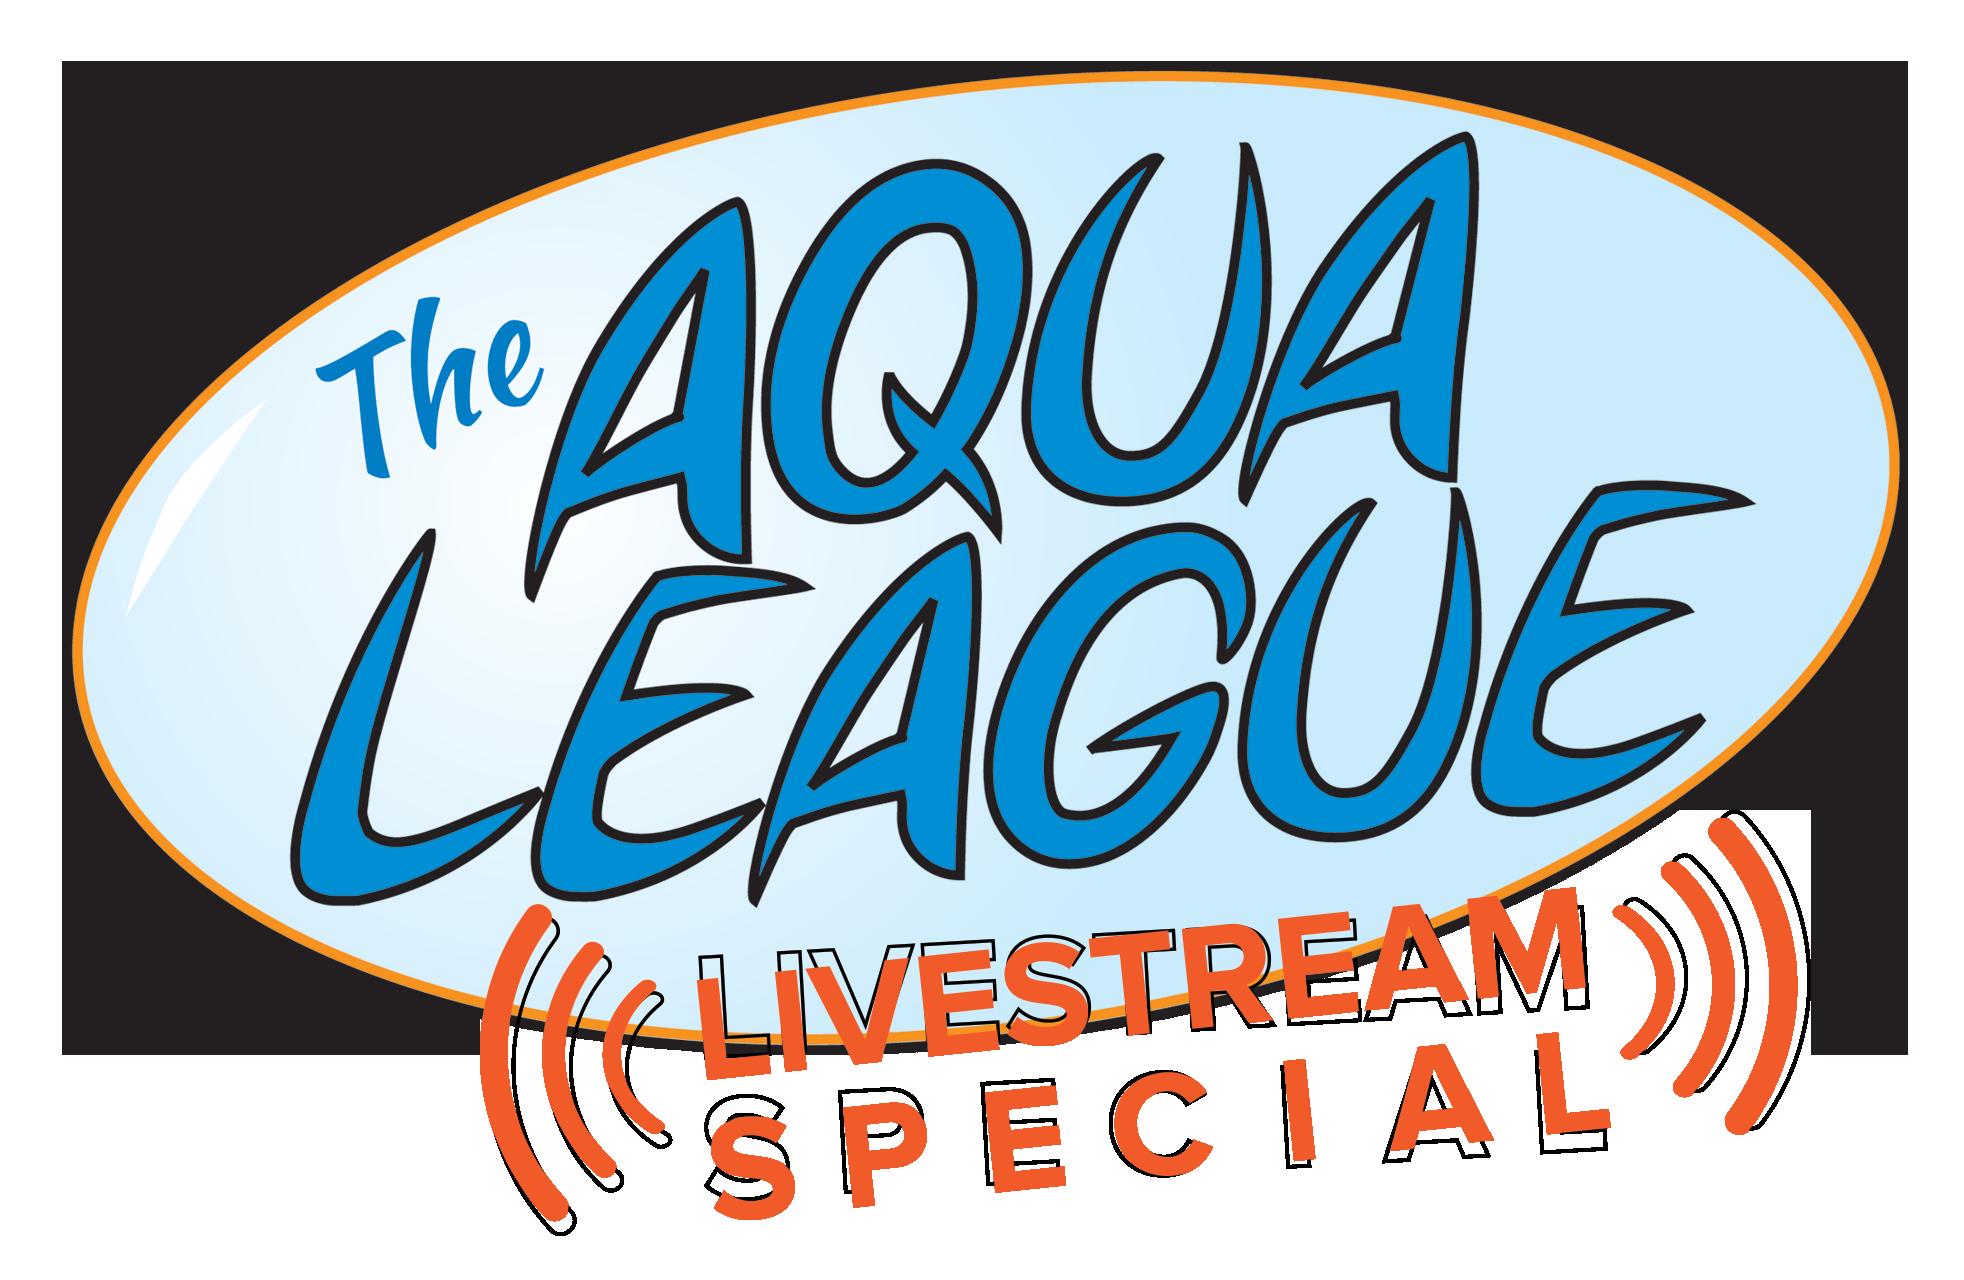 aqua league